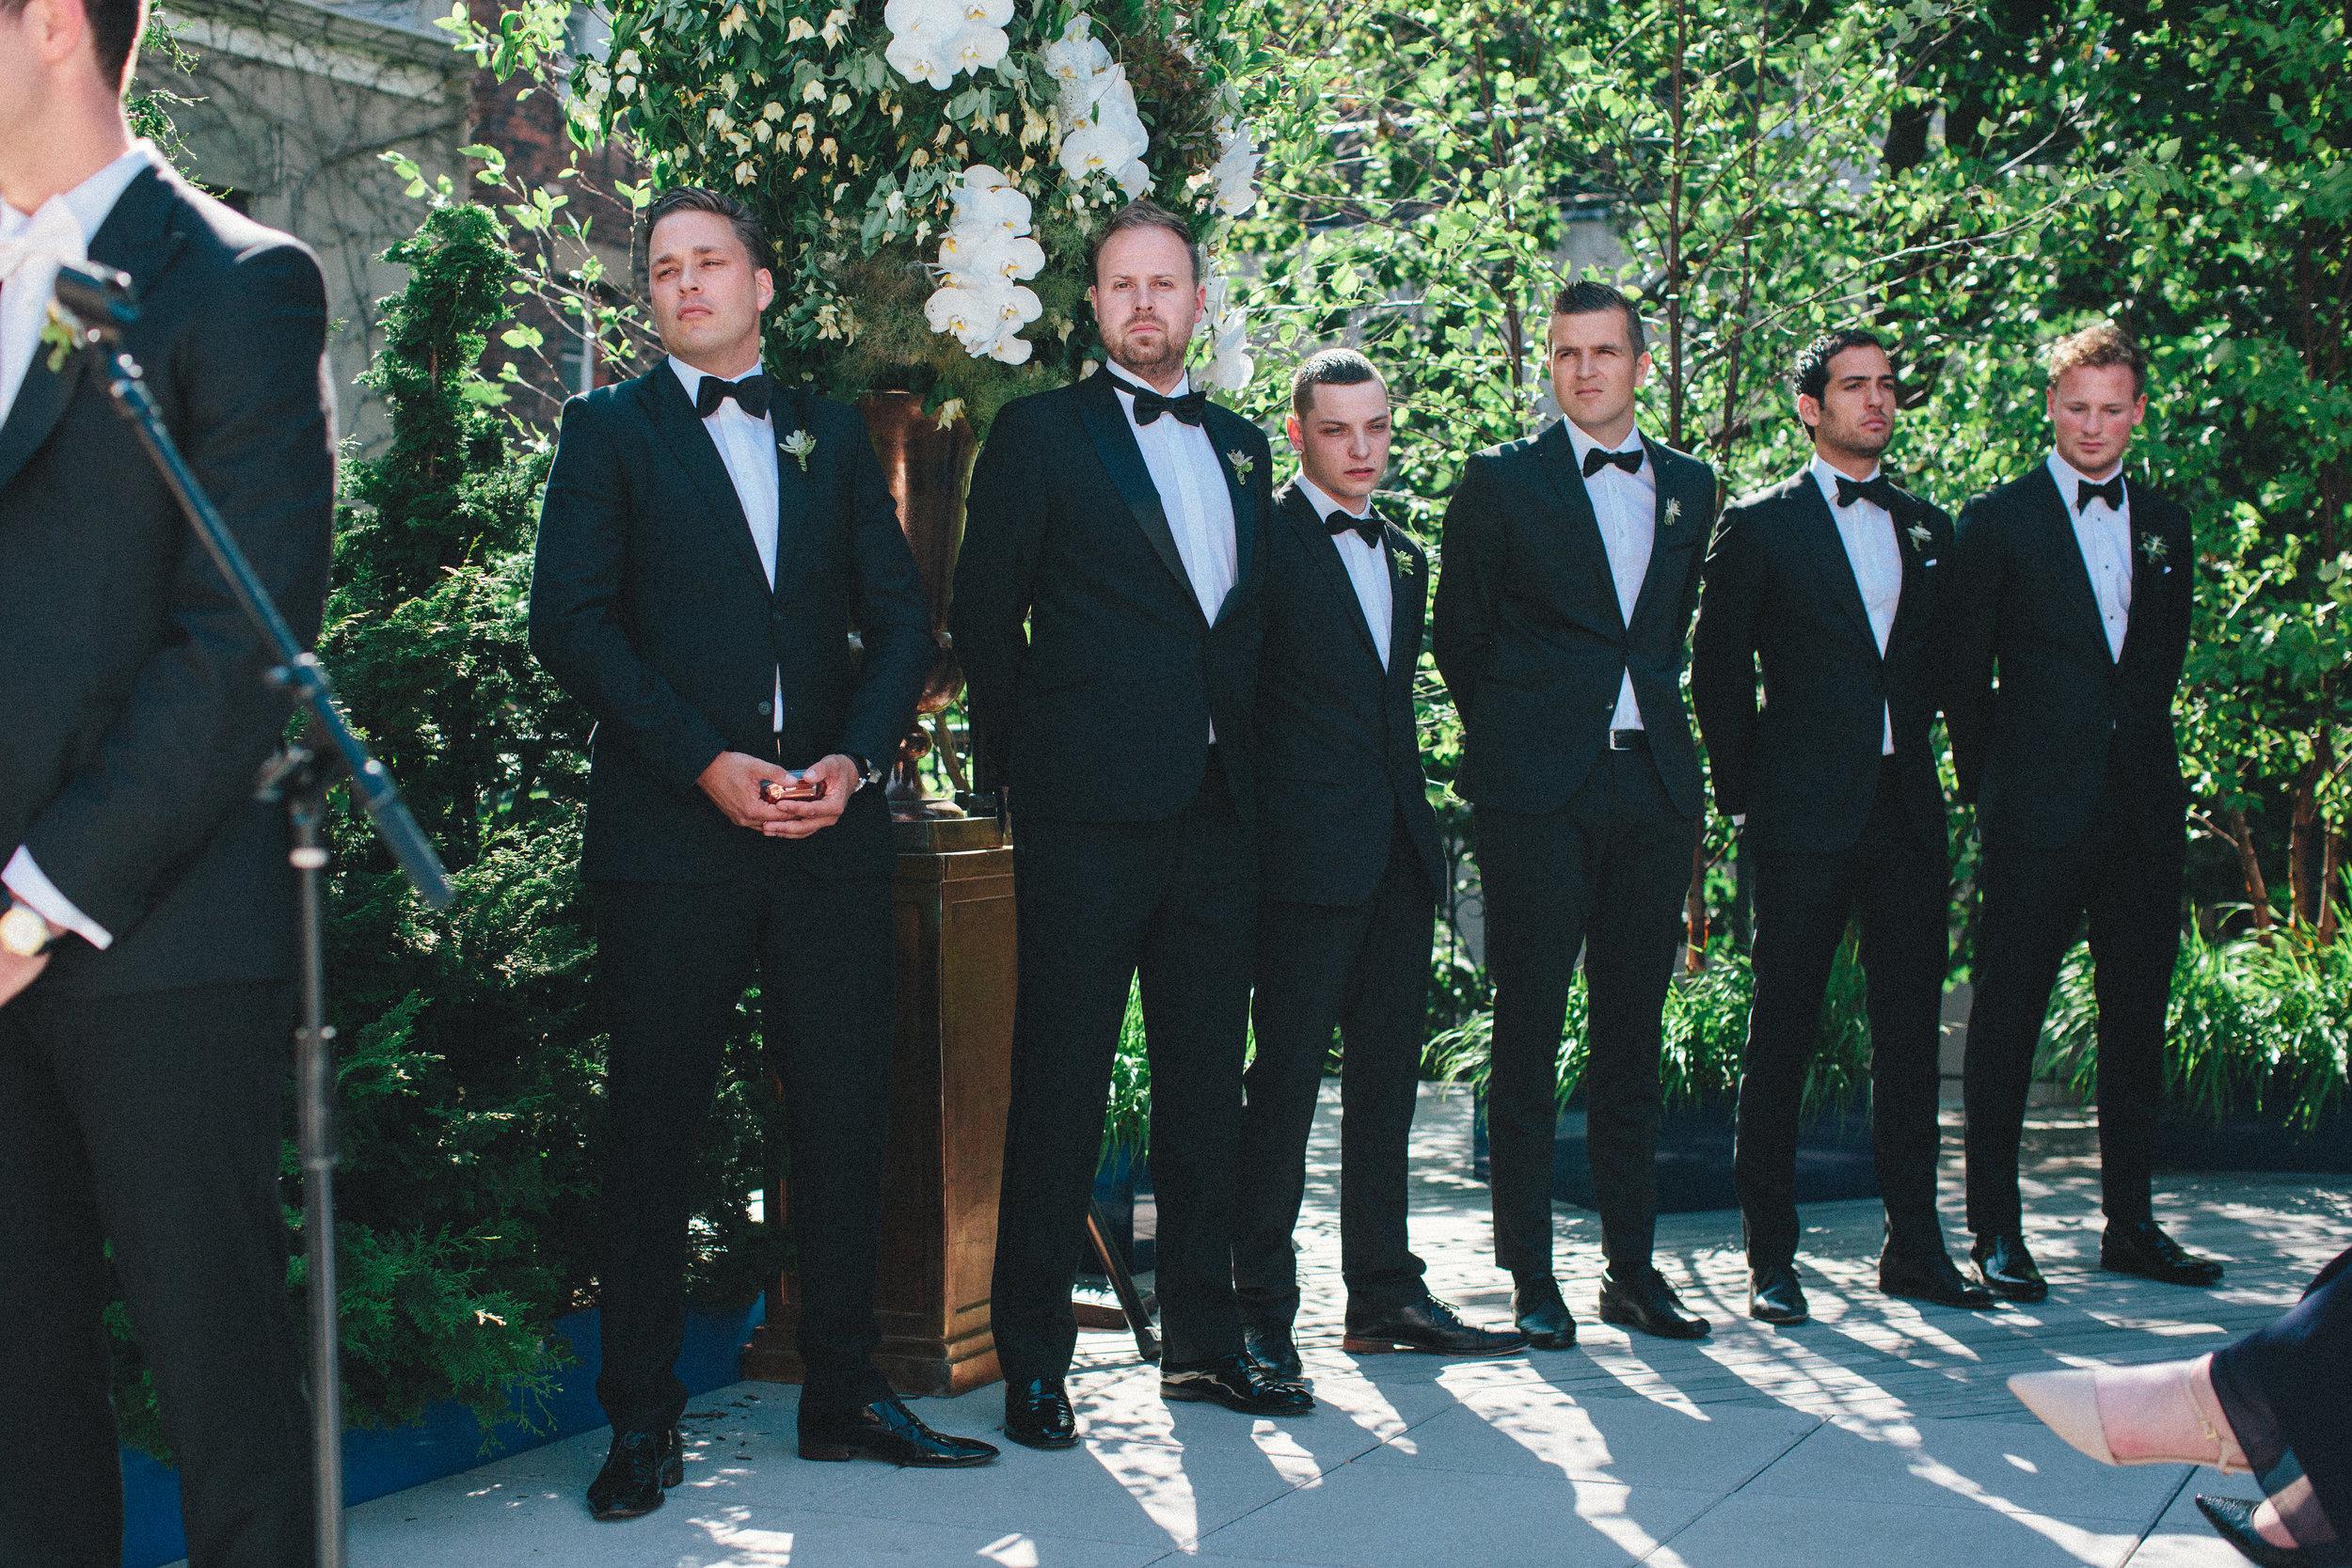 Copy of marla_jordy_wedding_jbobephoto-230.jpg